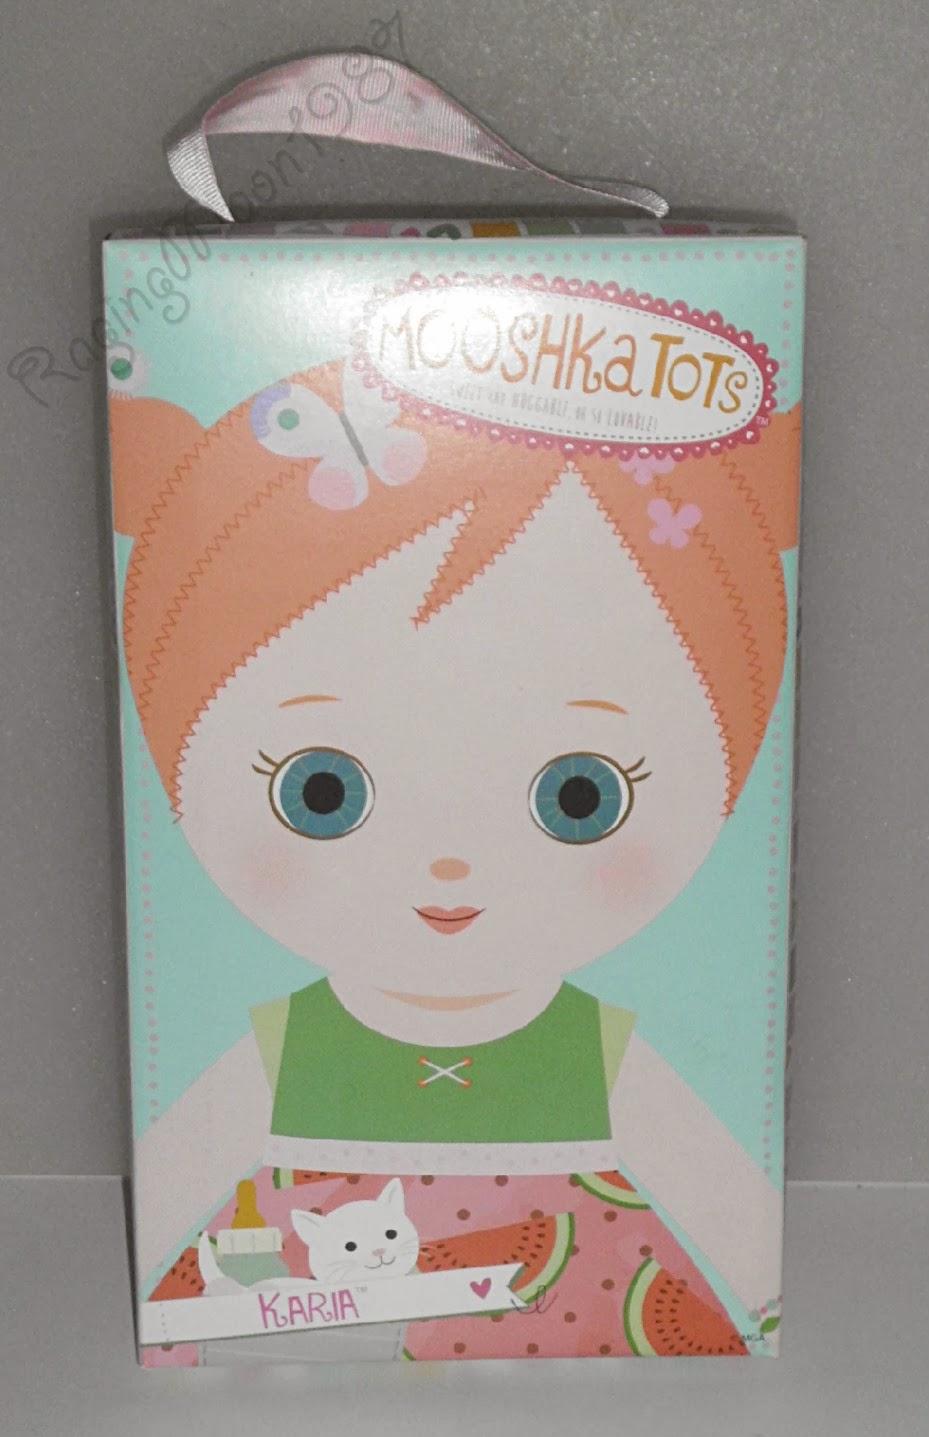 8 Best Moshkas images | Girl dolls, Dolls, Soft dolls | 1437x929